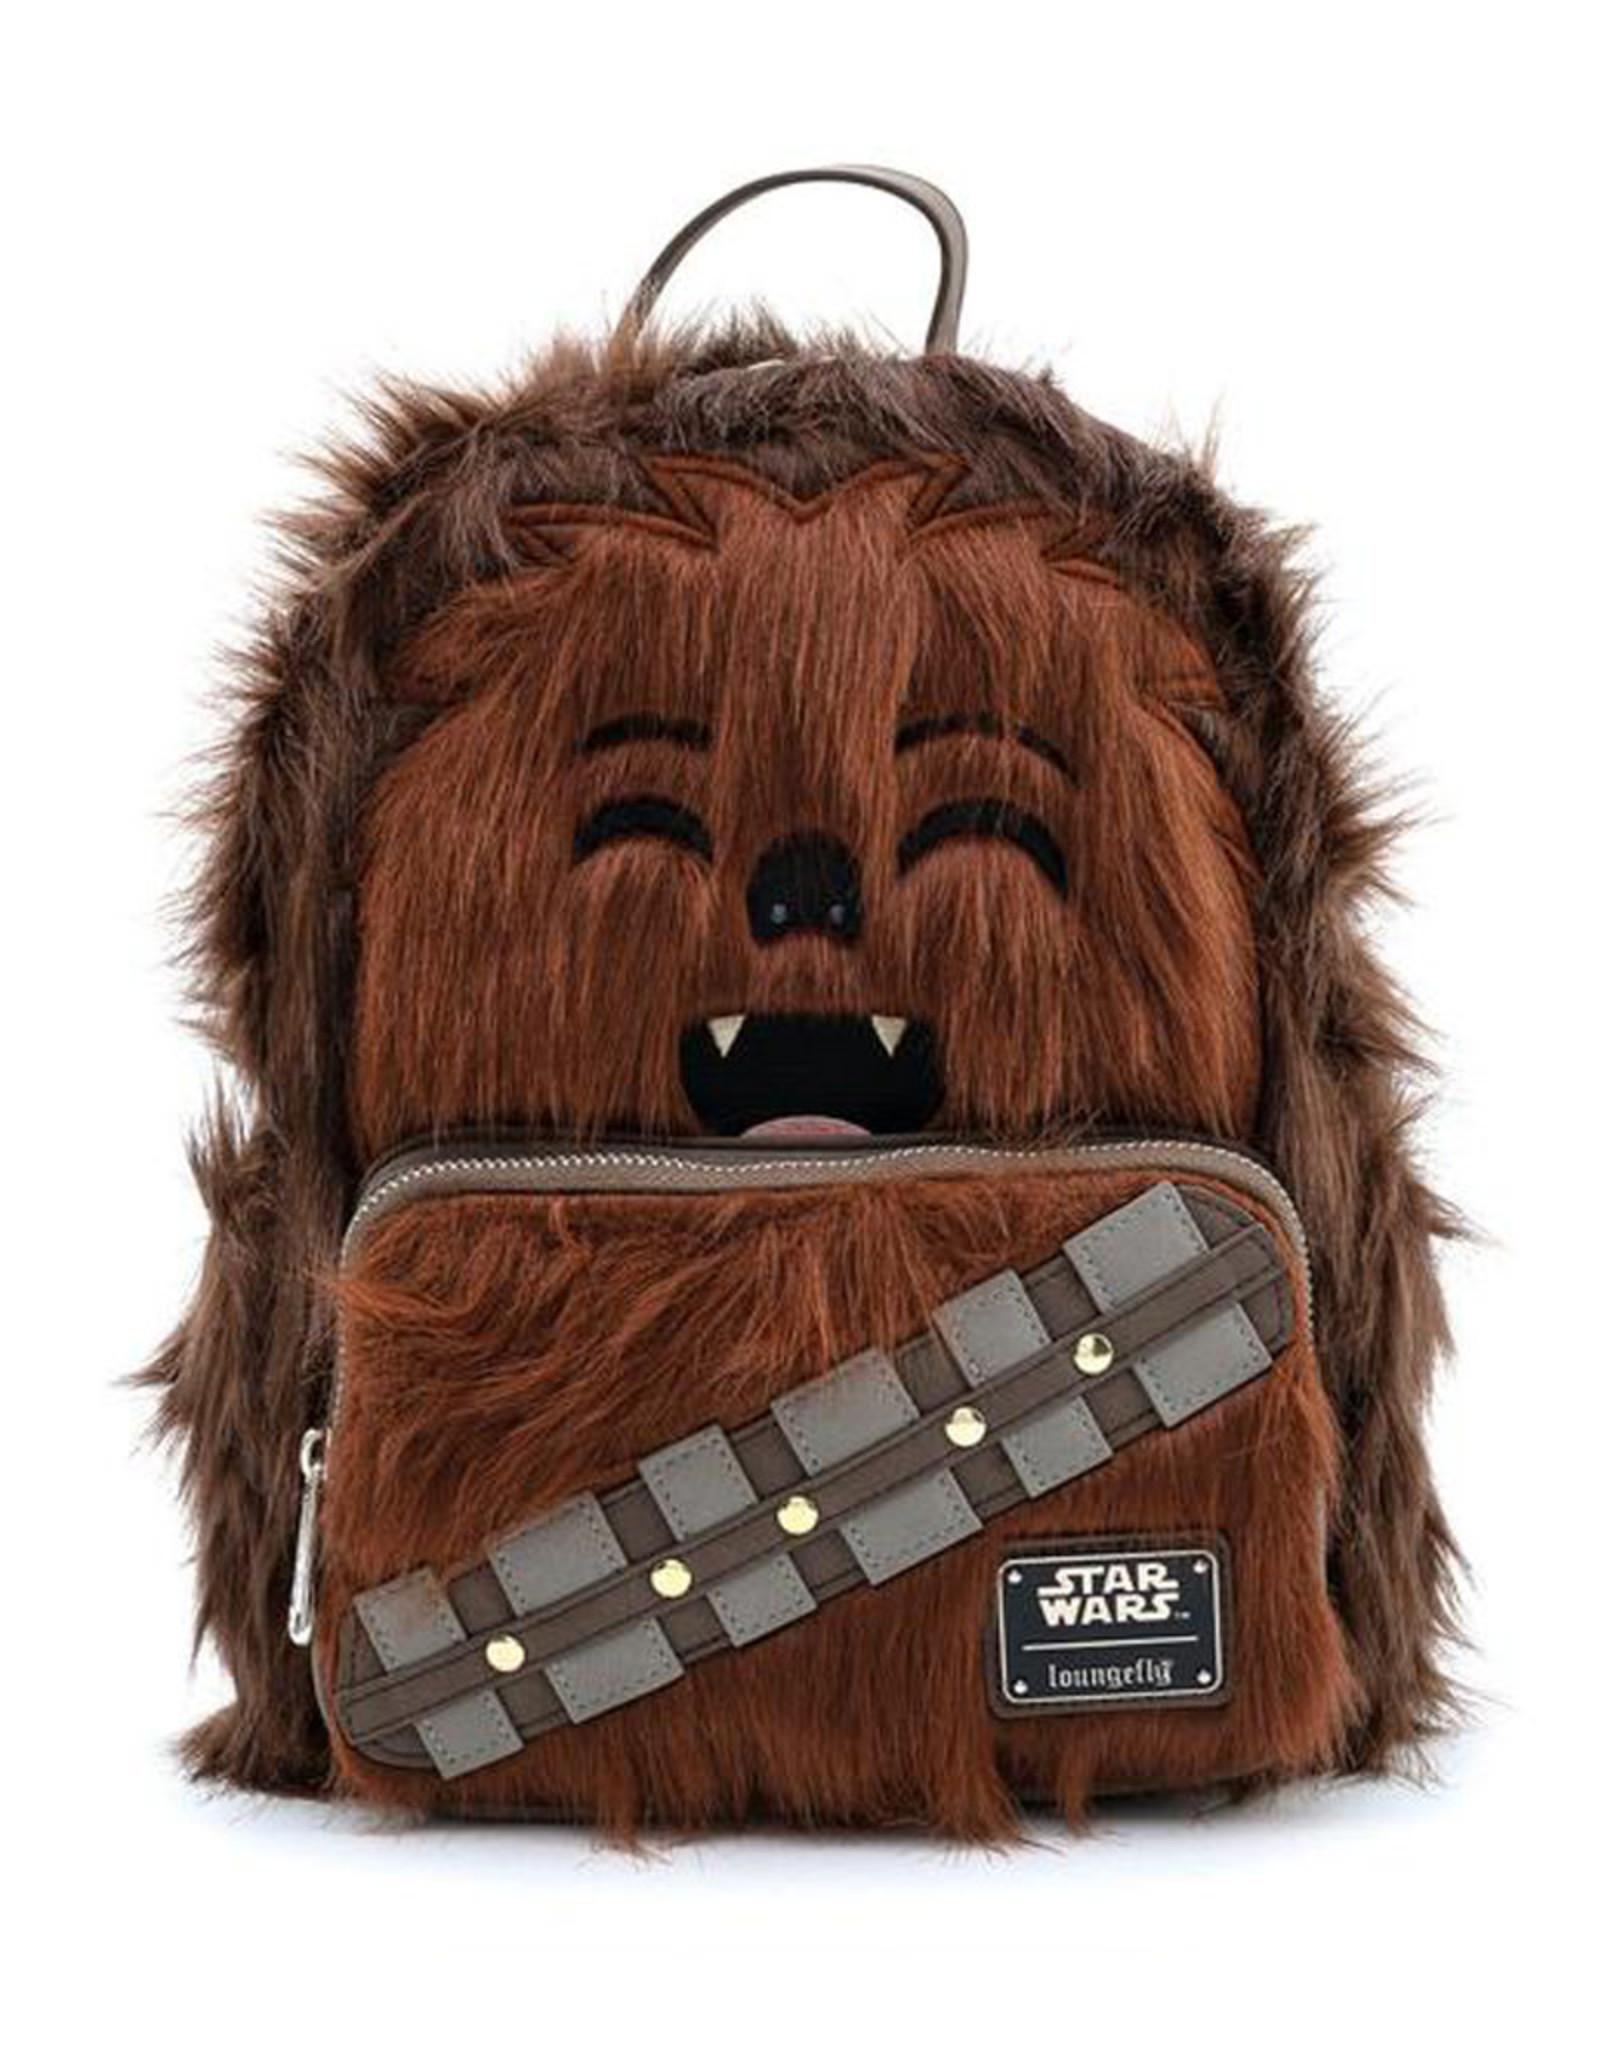 Star Wars Star Wars  ( Loungefly Mini Back Pack ) Chewbacca